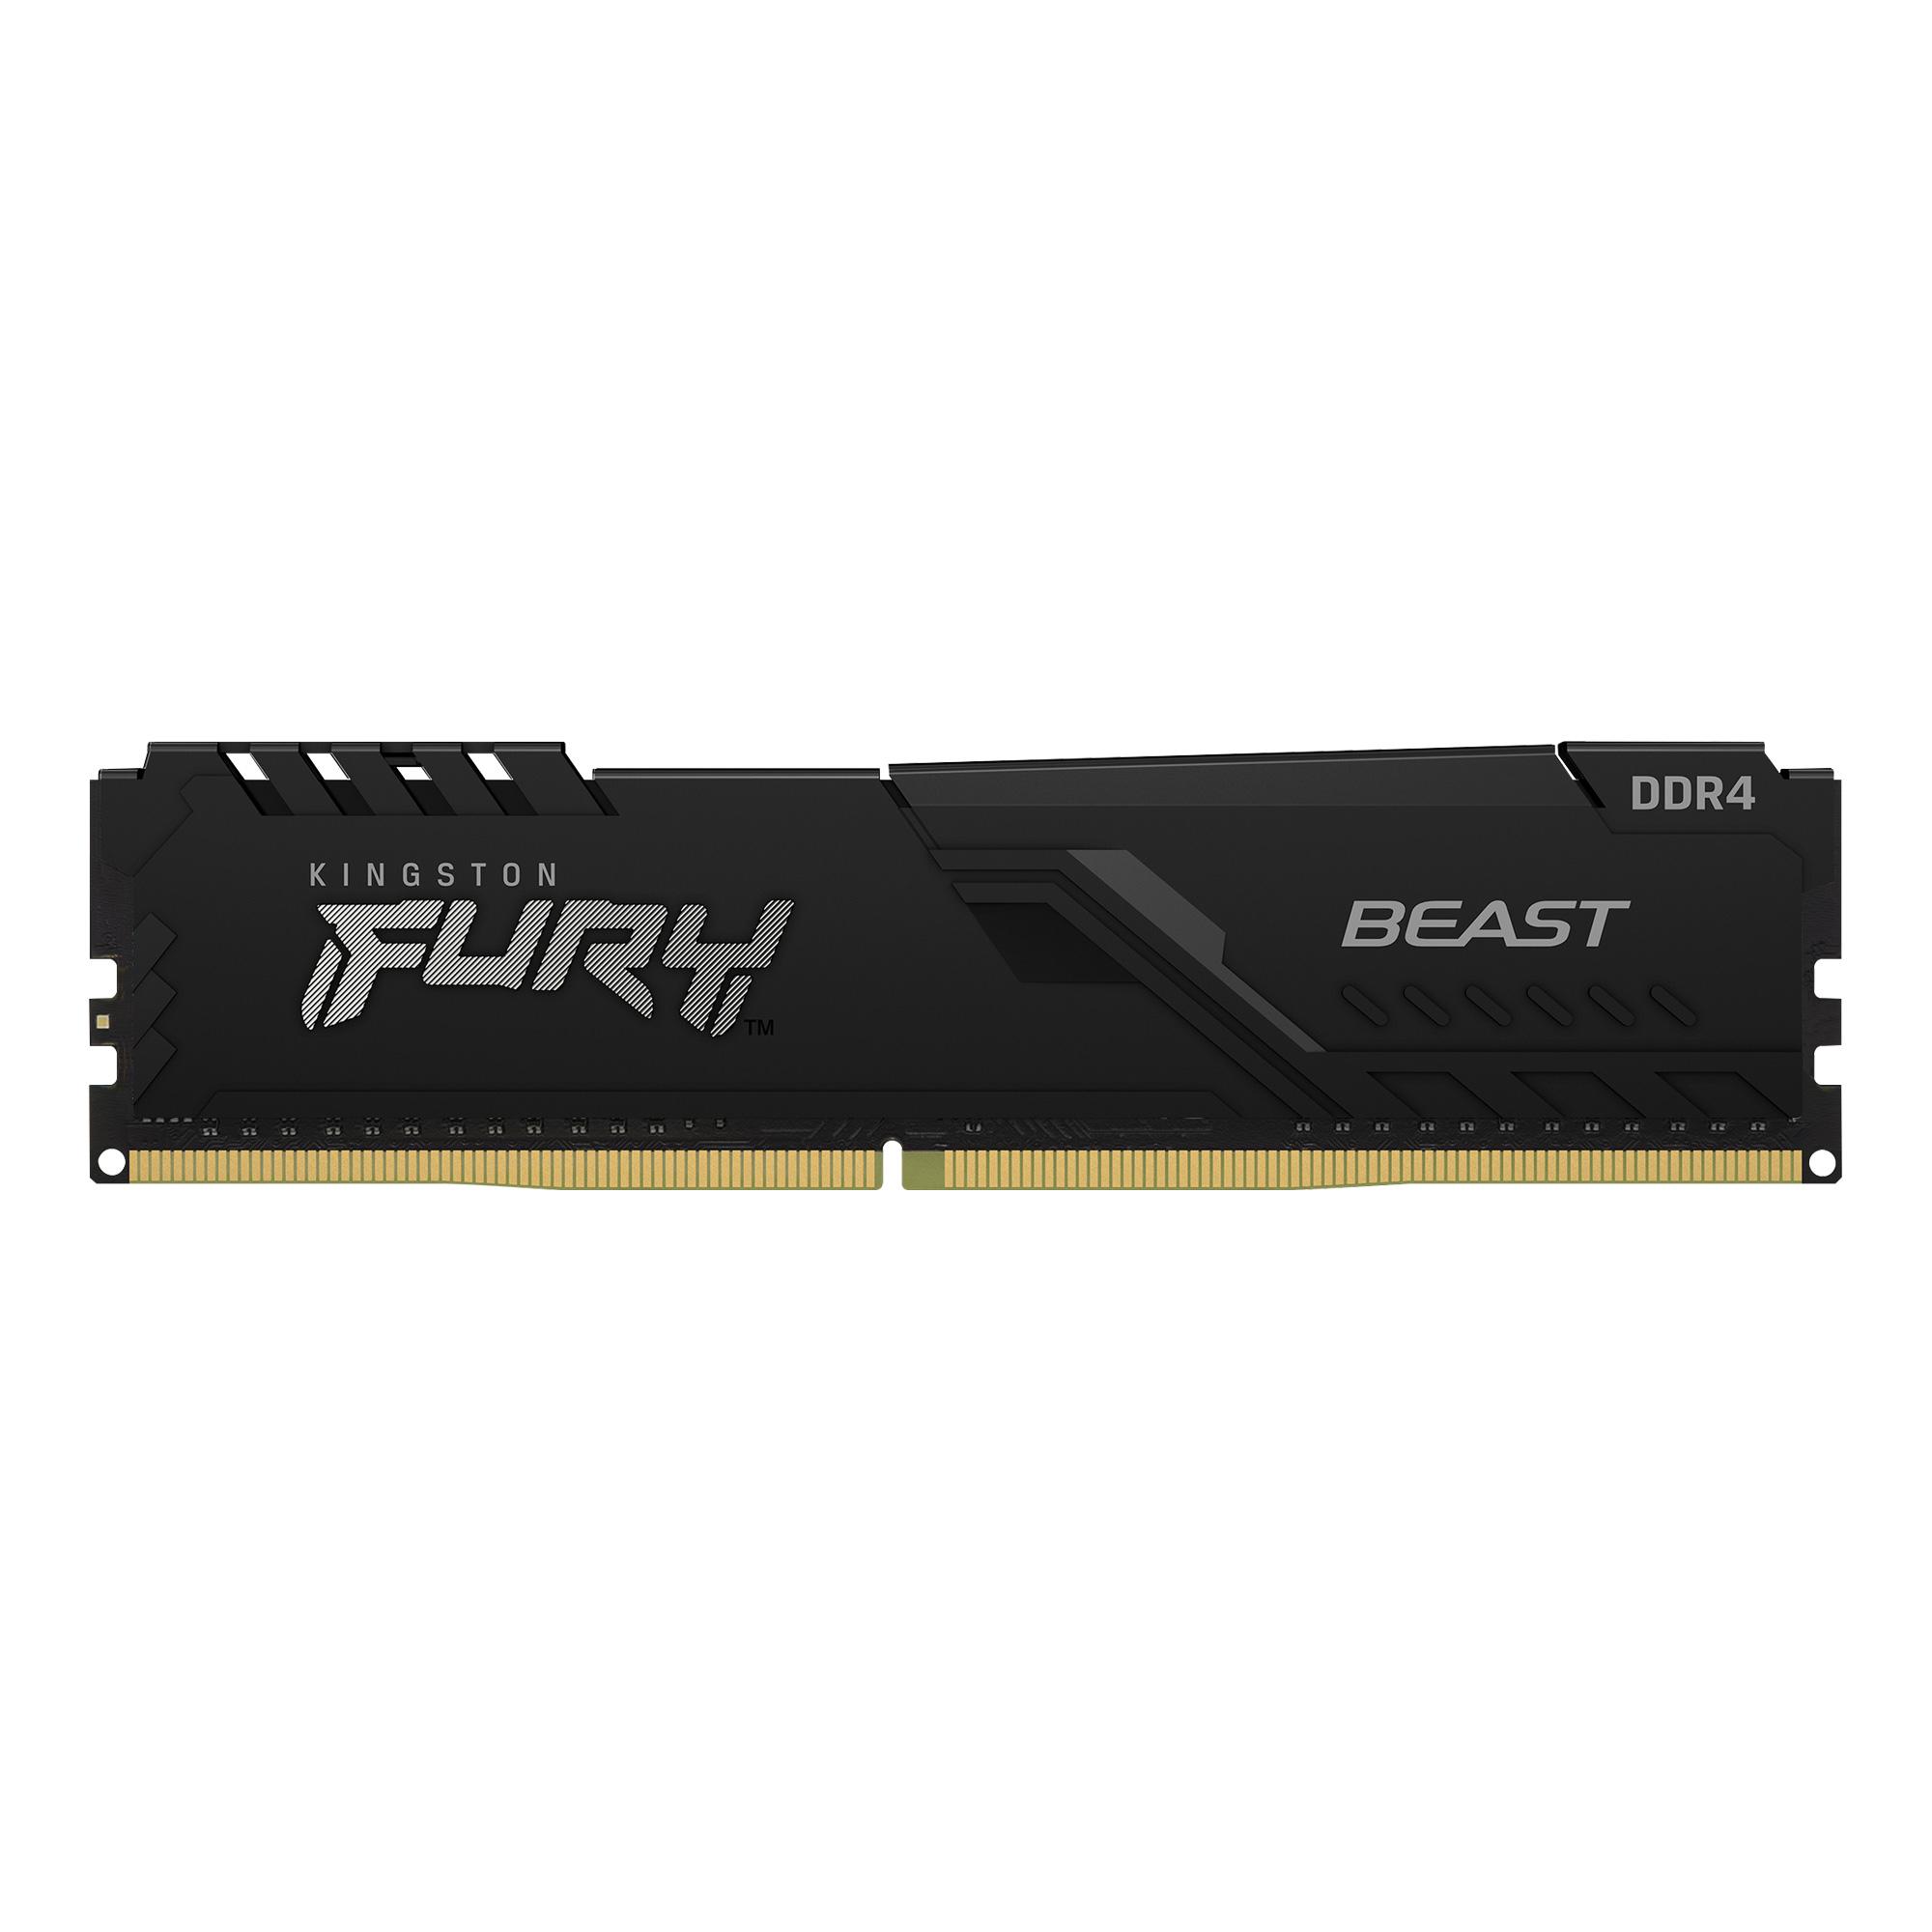 FURY BEAST MóDULO DE MEMORIA 8 GB 1 X 8 GB DDR4 3200 MHZ